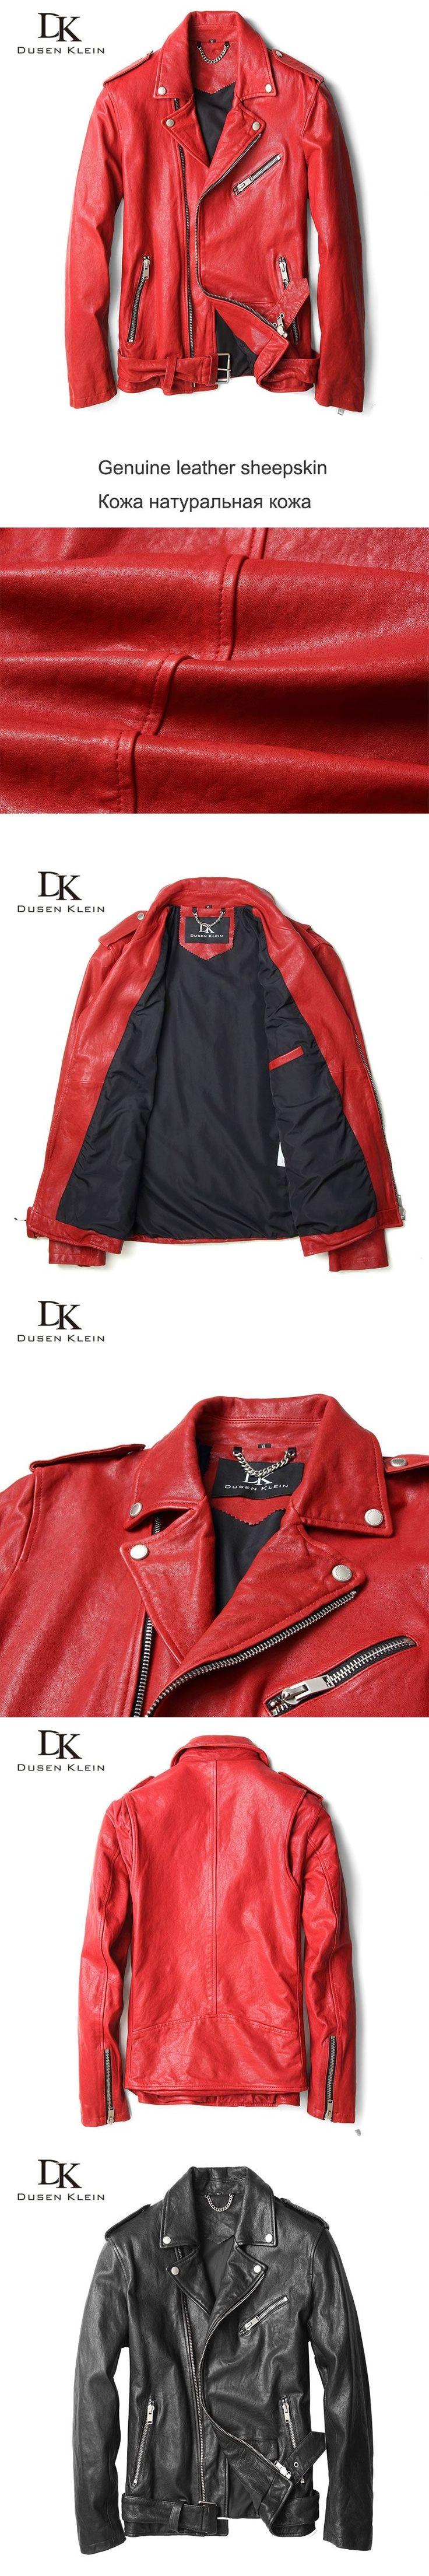 Male leather jacket motorcycle Dusen Klein  Leather coats for men Luxury Desinger coat Slim Nature sheepskin jacket red 71U8185